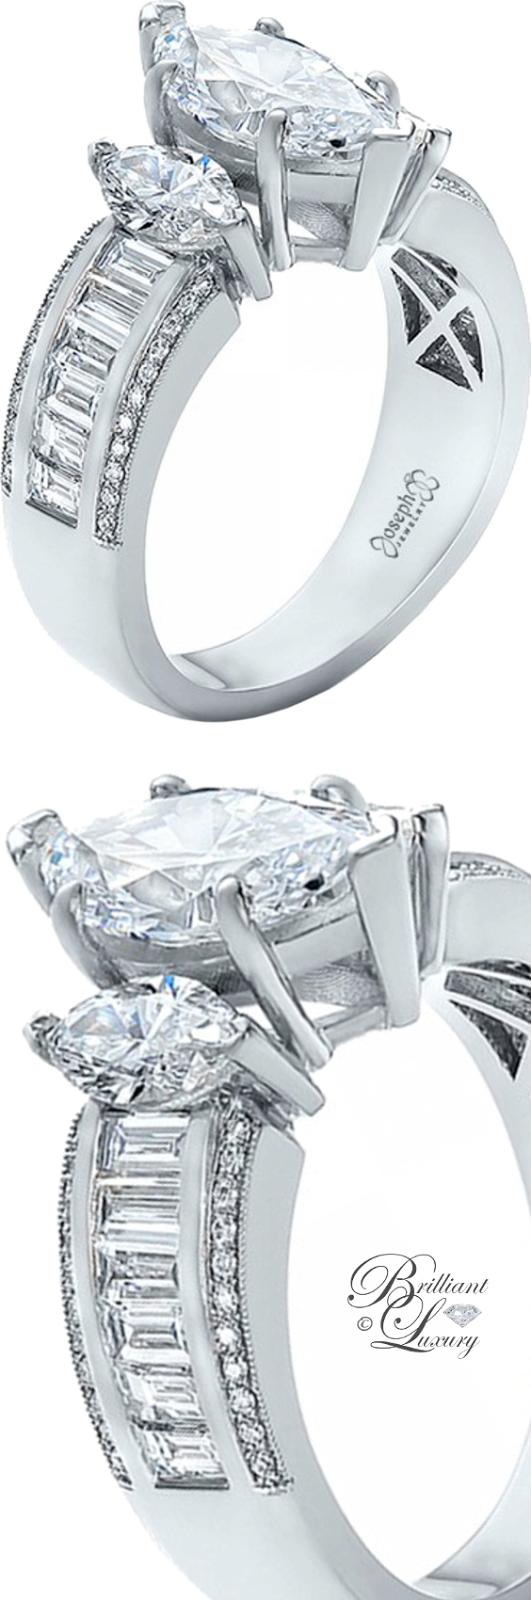 Brilliant Luxury ♦ Custom Three Stone Marquise & Baguette Diamond Engagement Ring